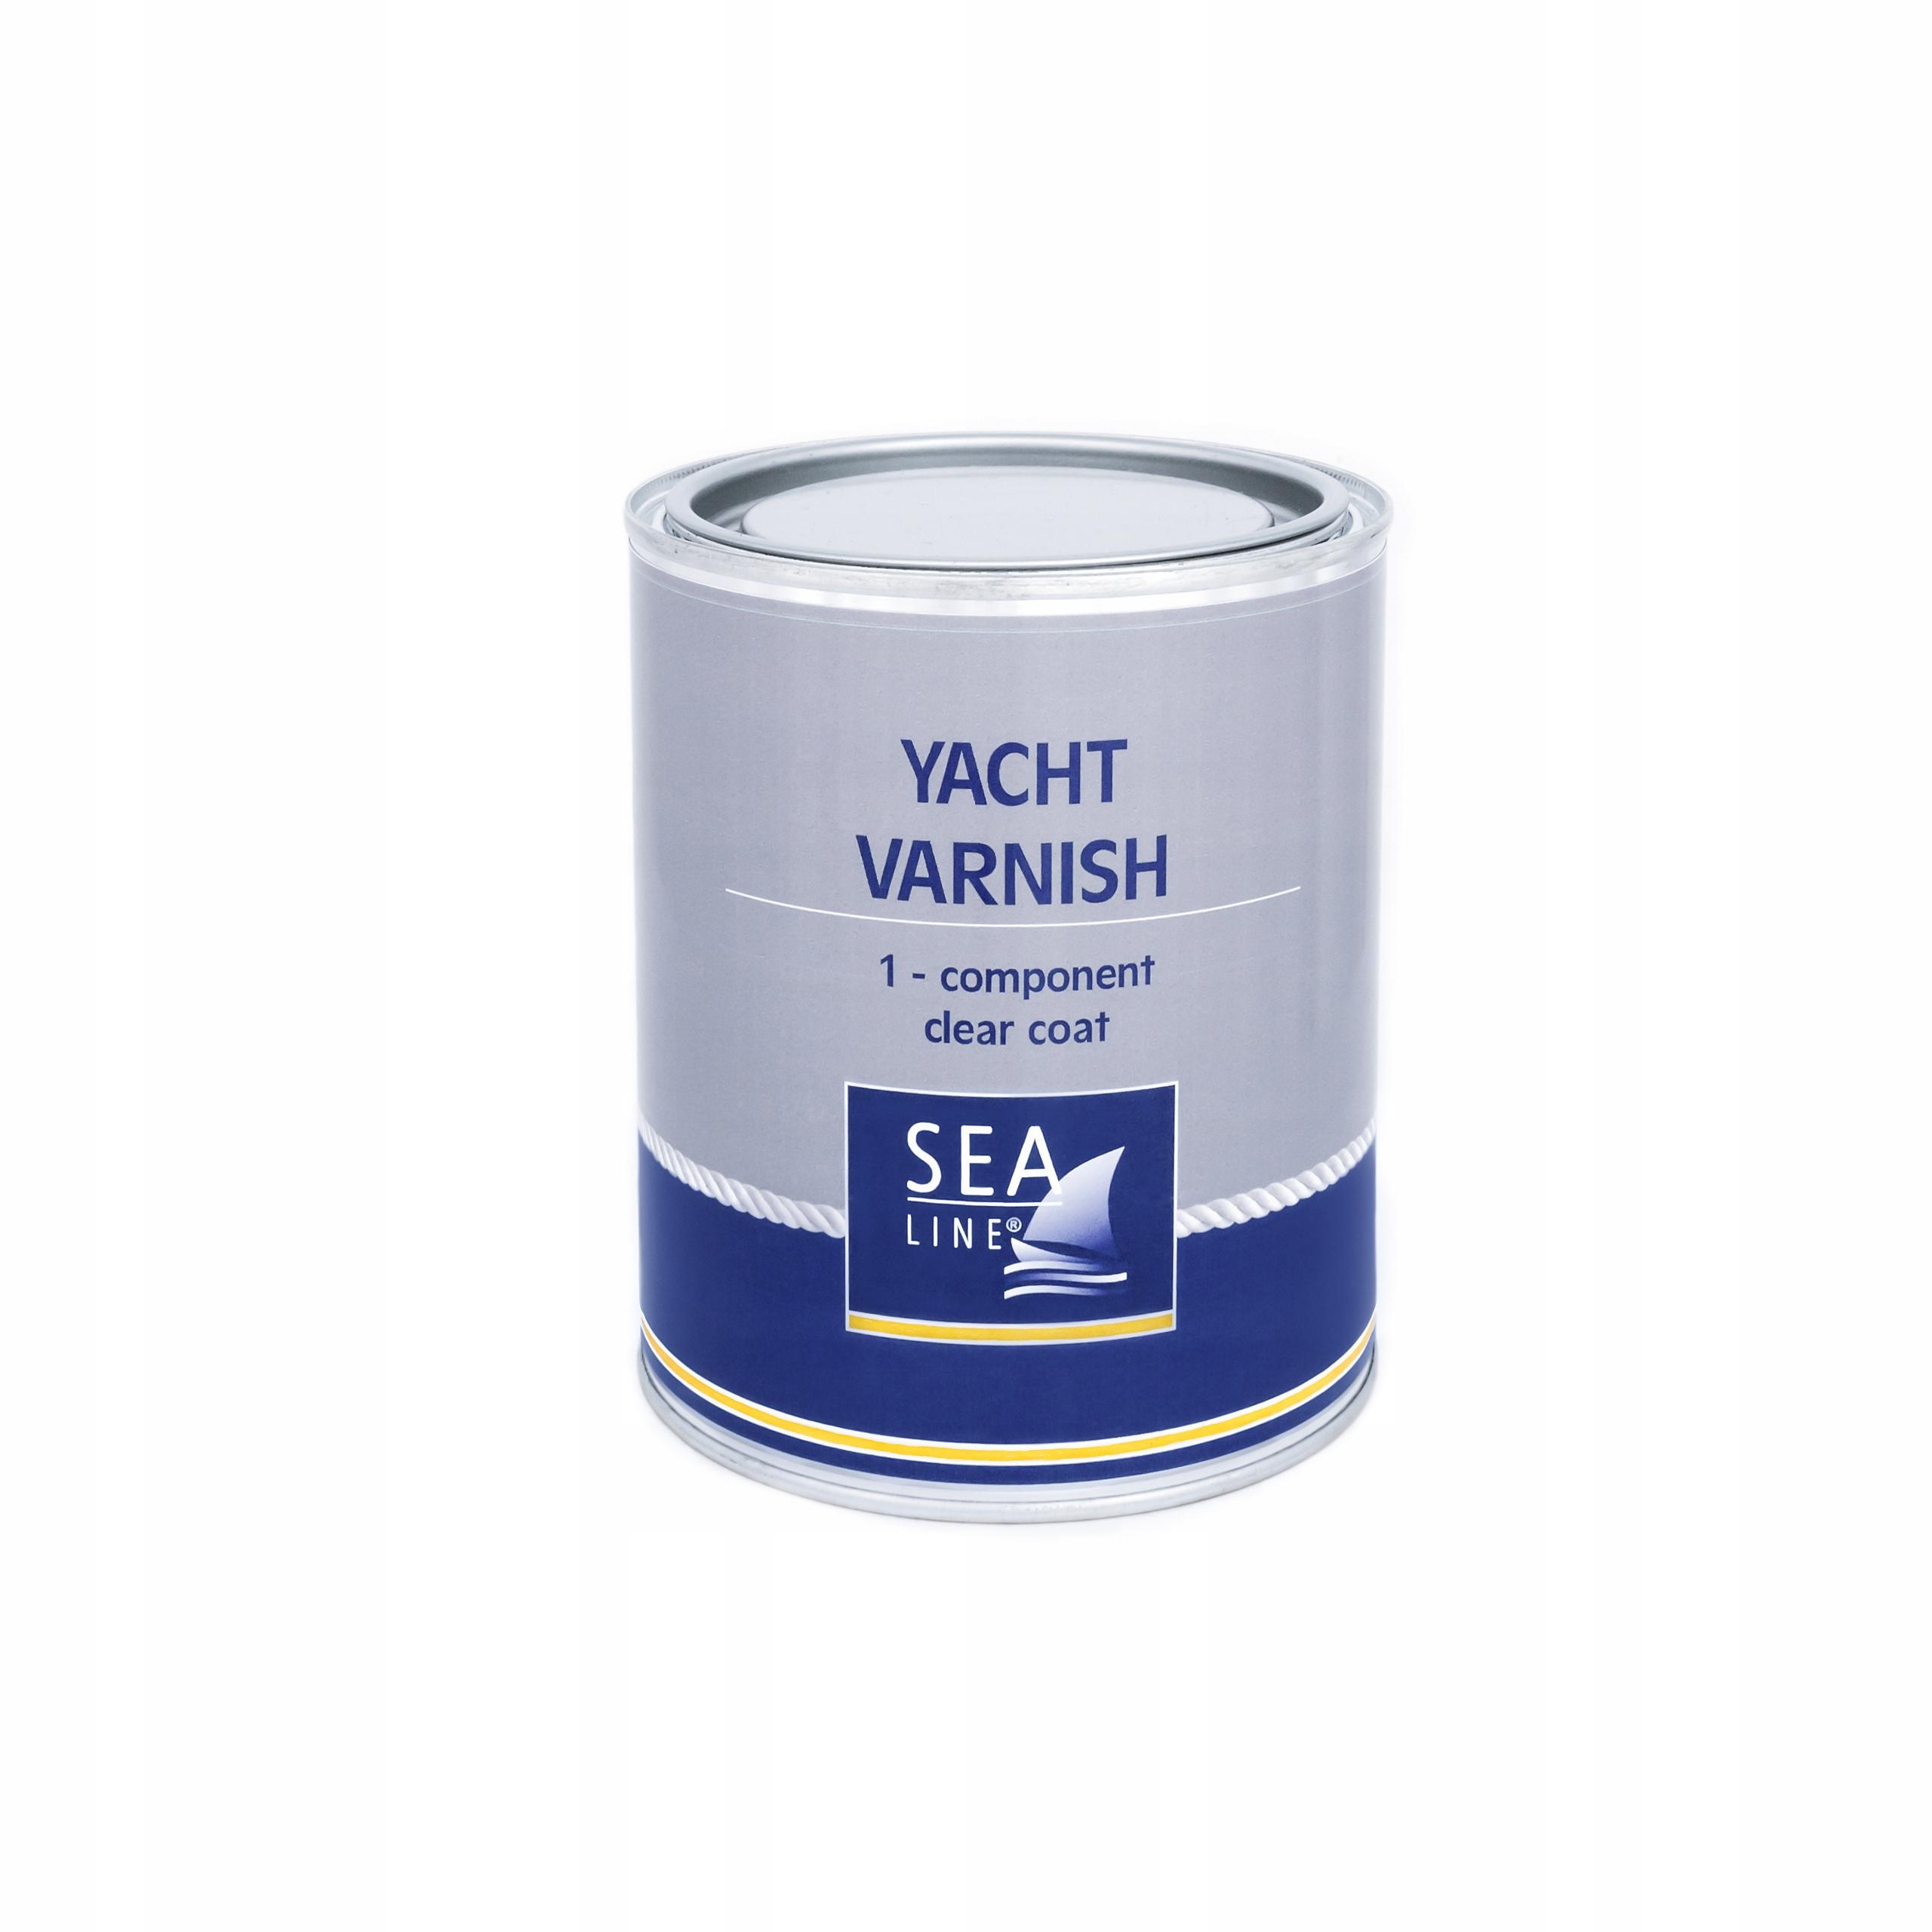 Clear yacht varnish makita impact socket 21mm